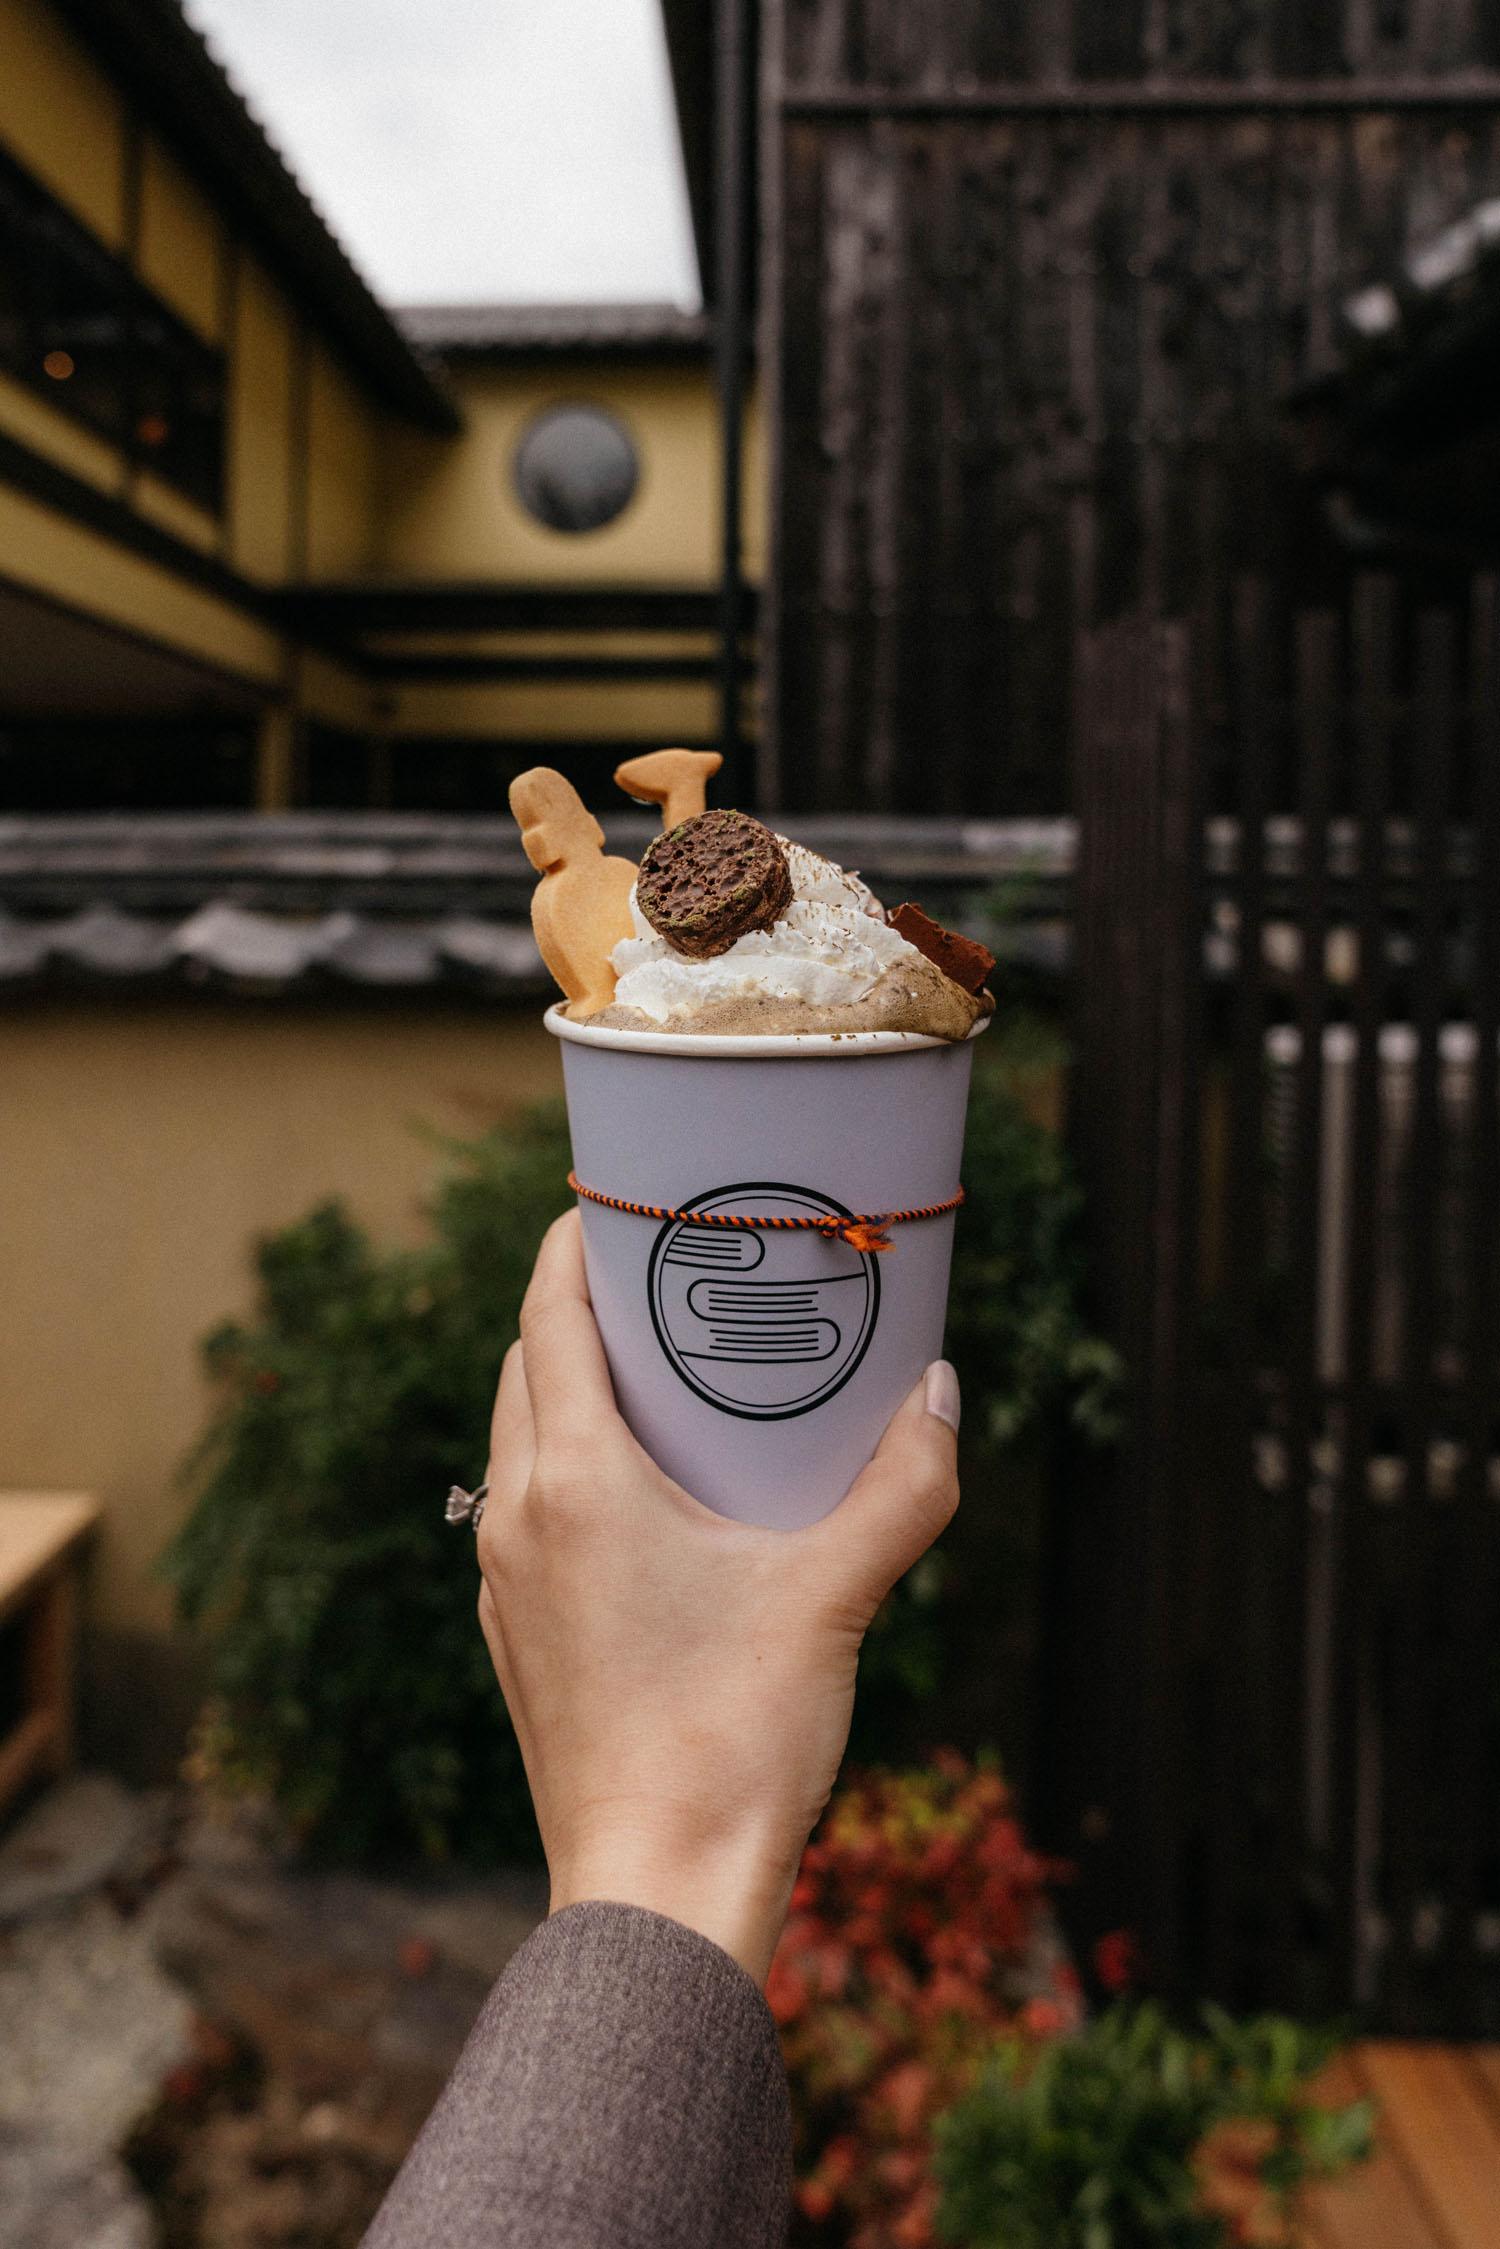 Roasted green tea / floatie break after Nara Park